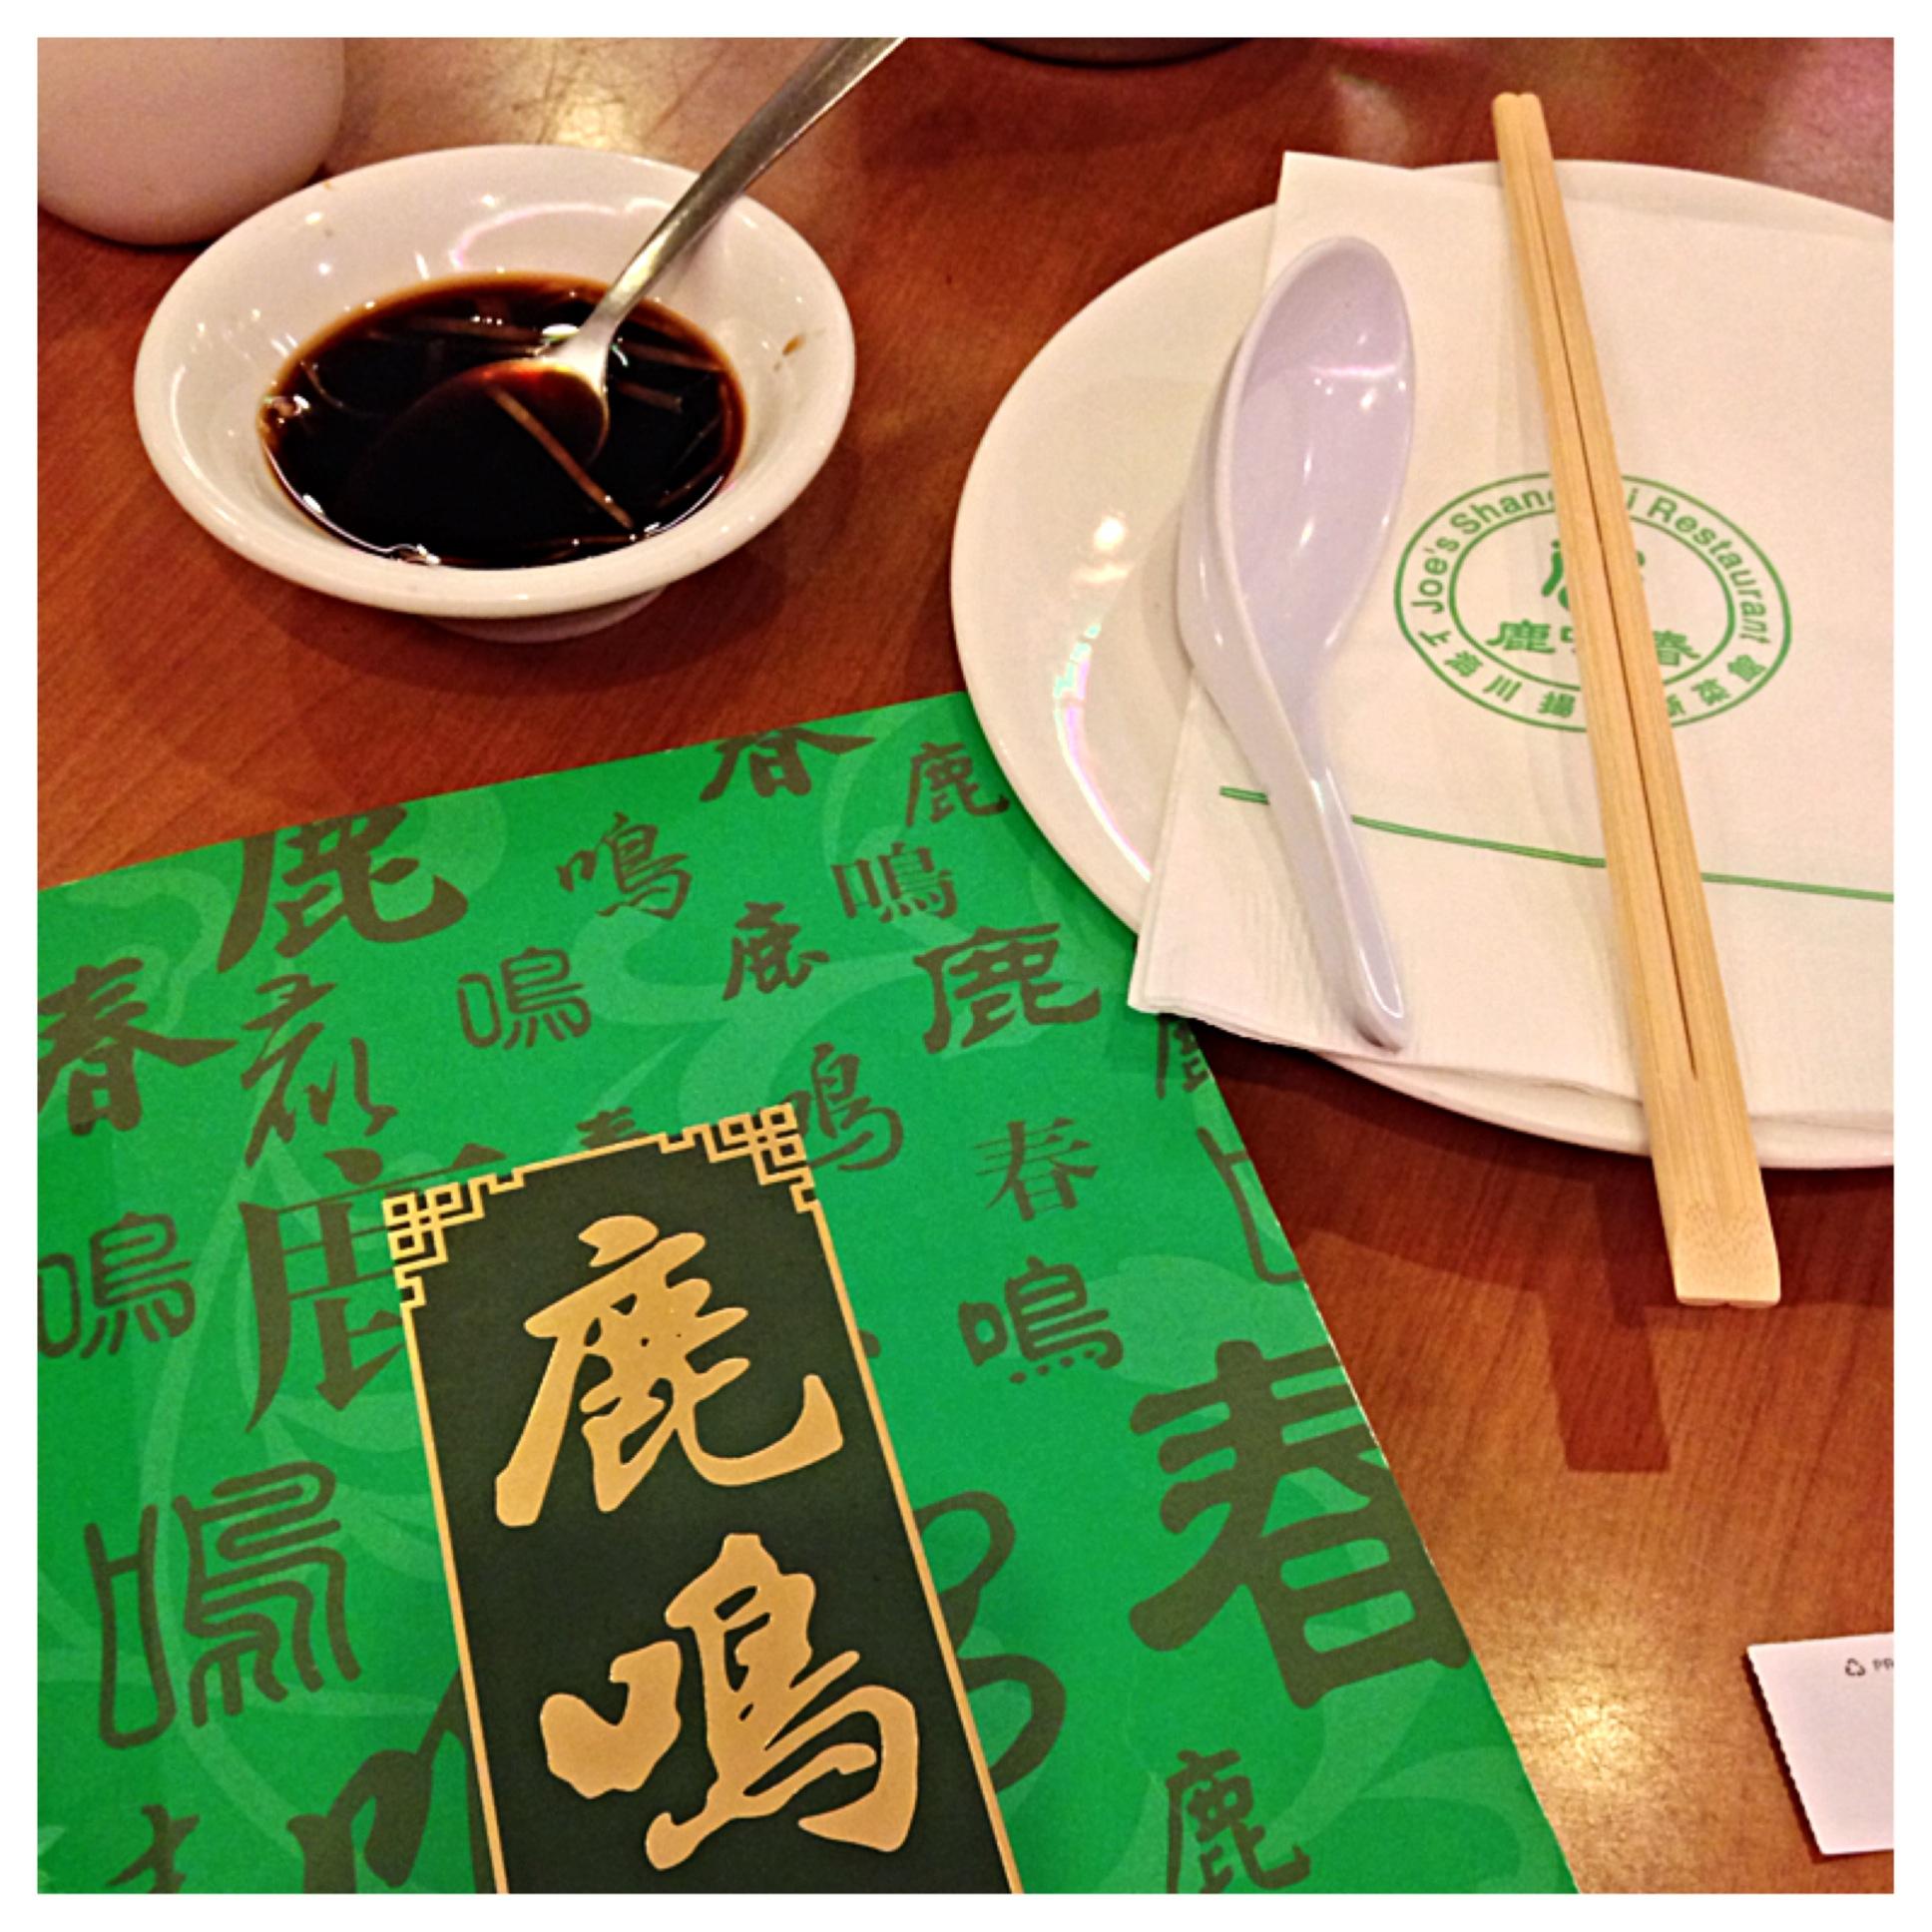 Joe S Shanghai Sprung On Food